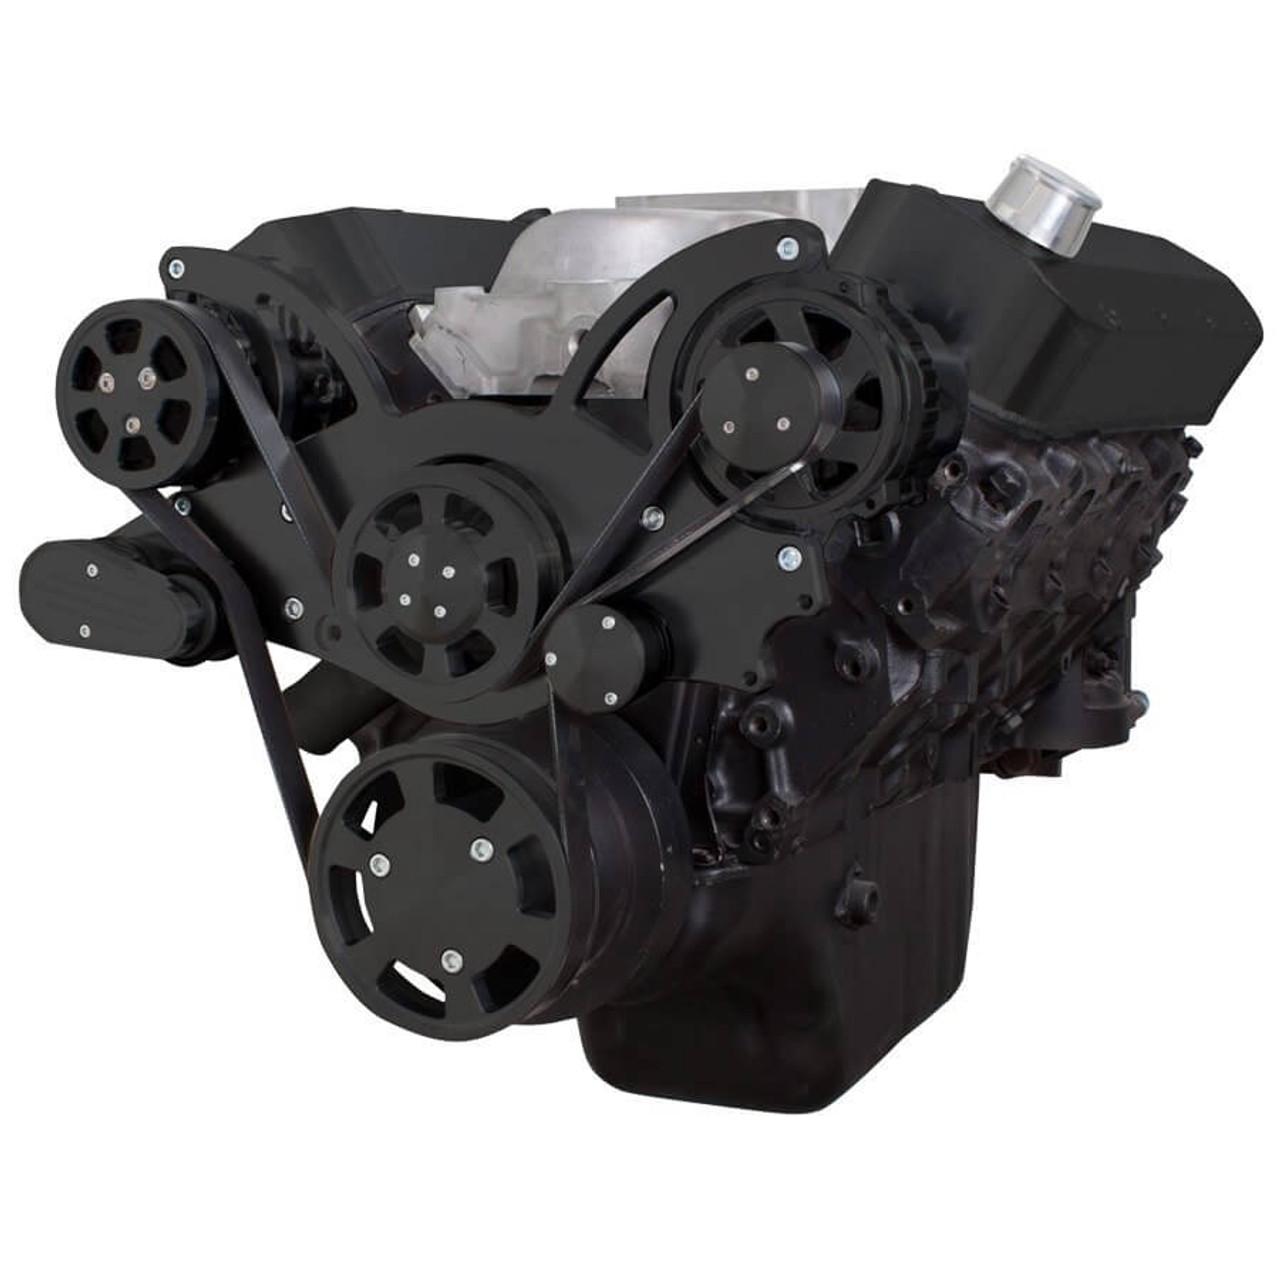 Black Serpentine System for 396, 427 & 454 - AC & Alternator